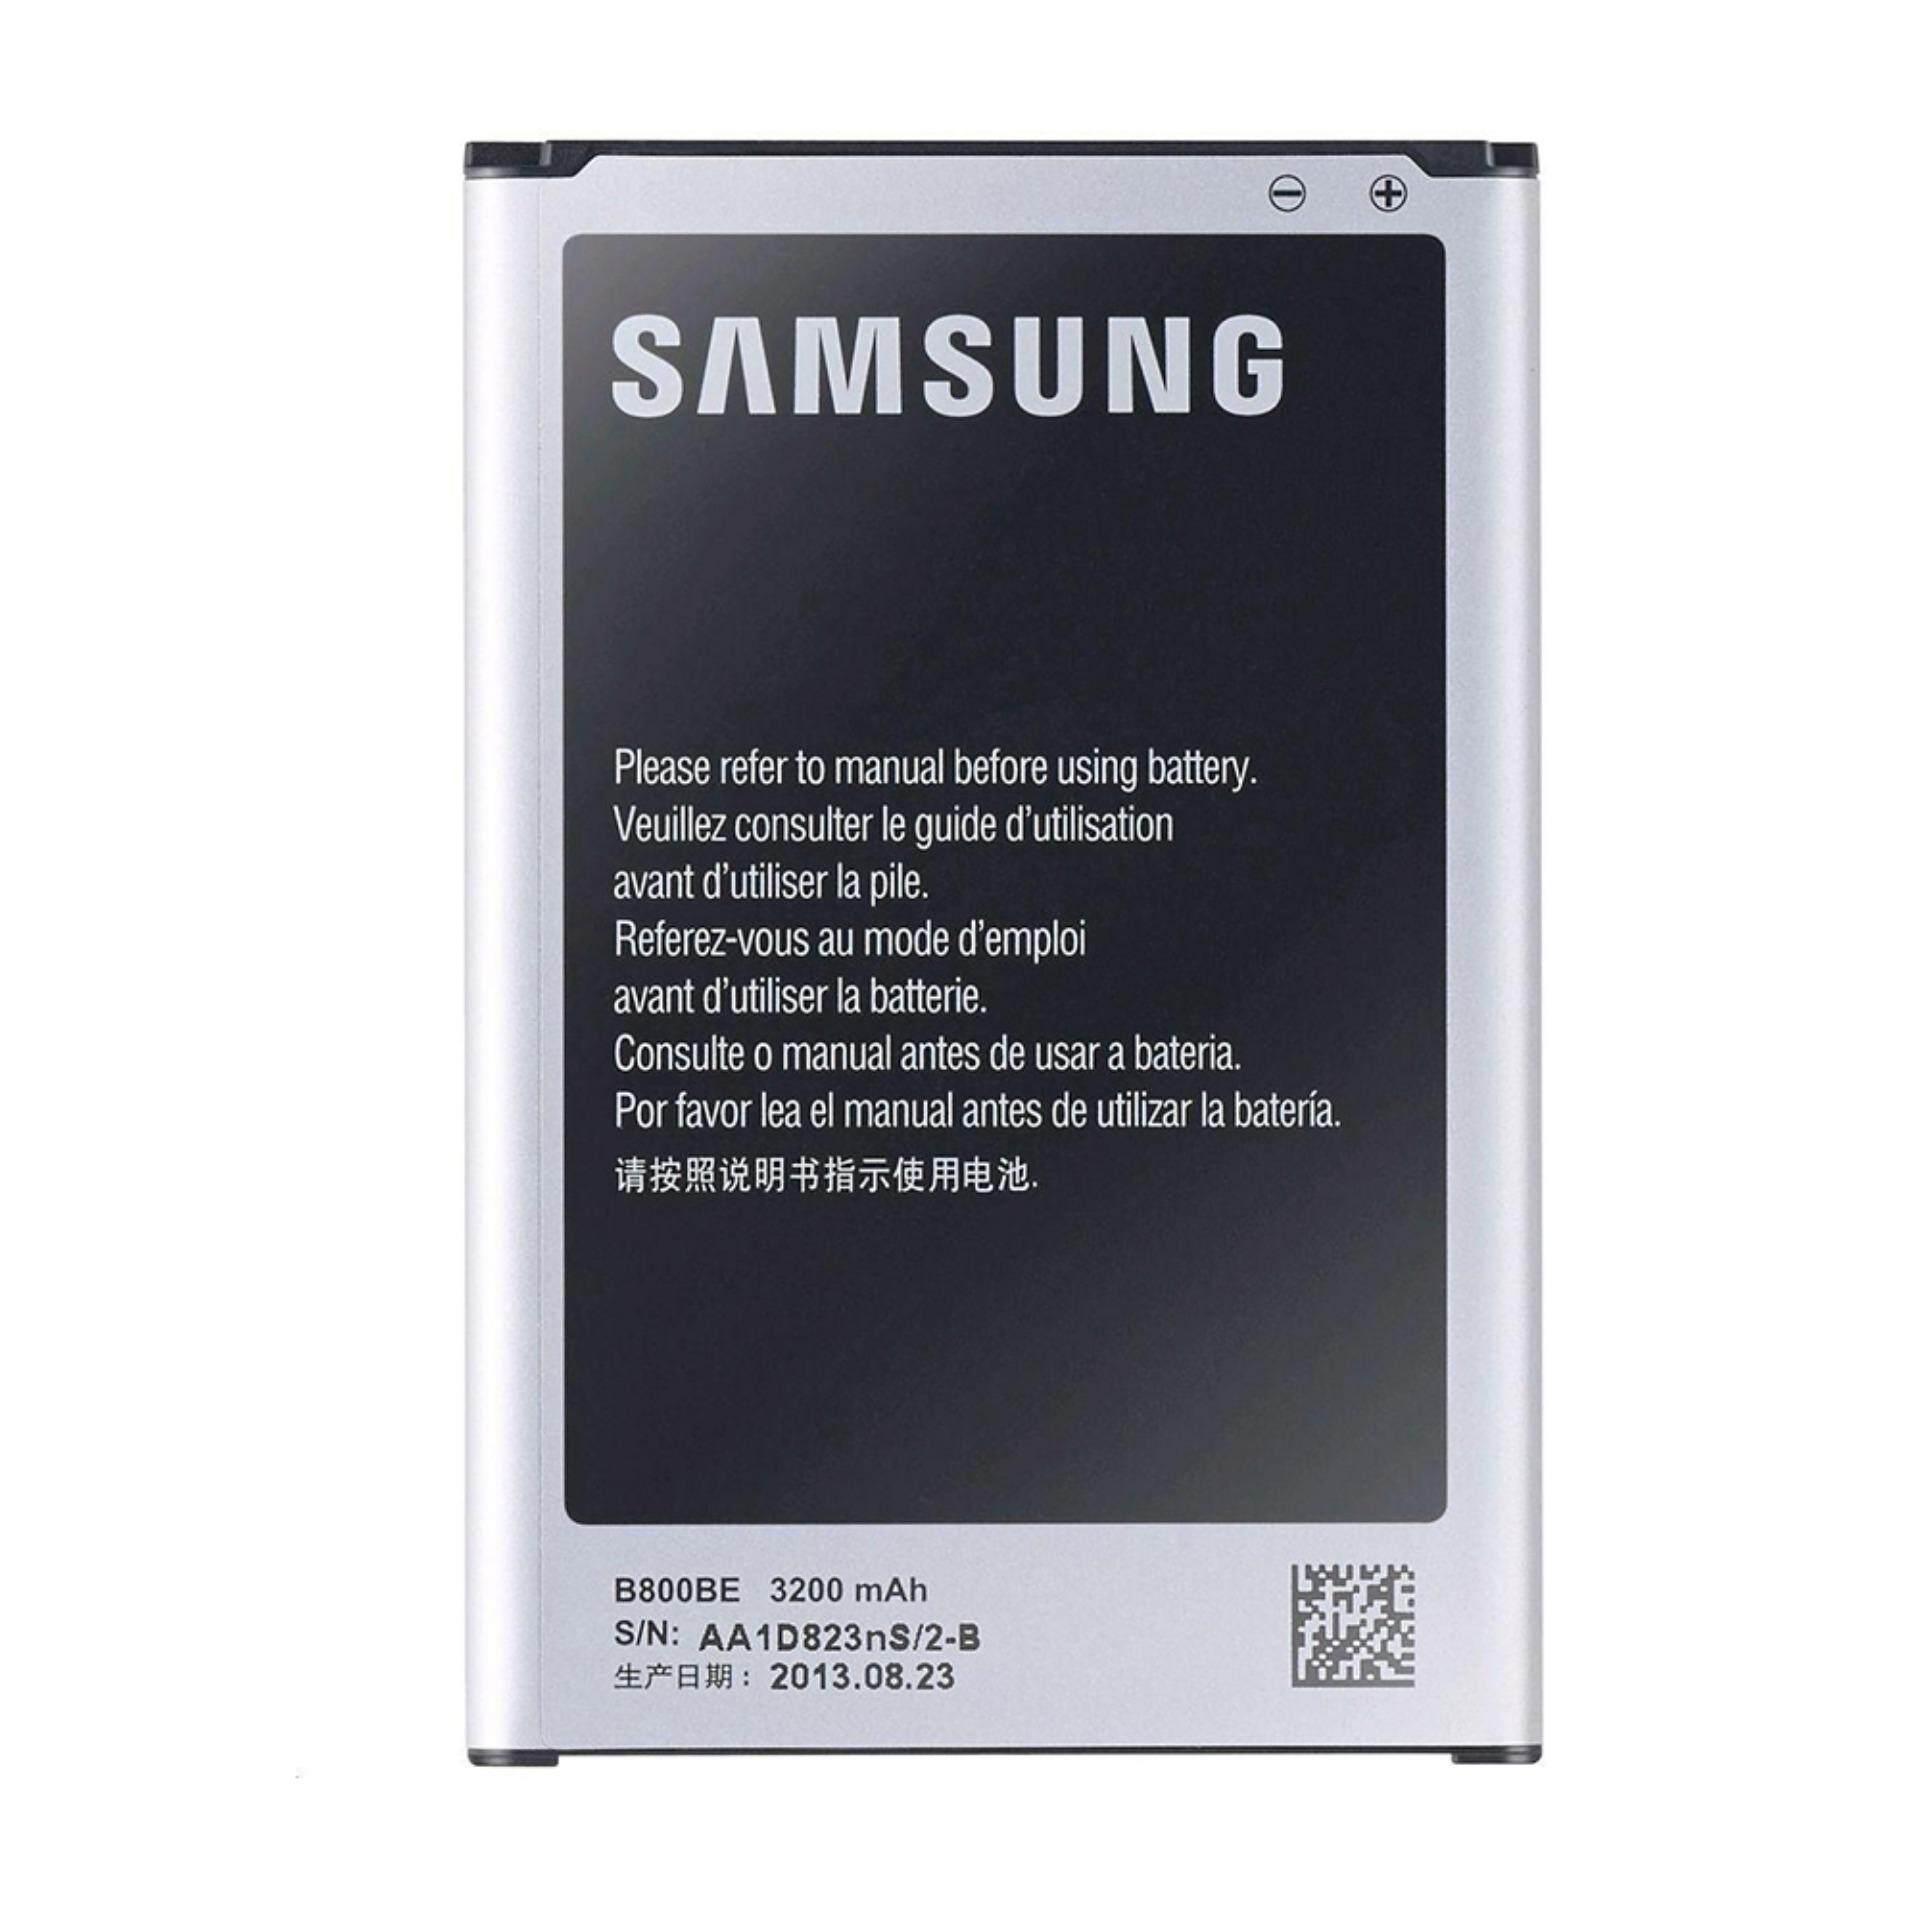 [ORIGINAL] SAMSUNG Galaxy Note 3 Battery 3200mAh [N9000]